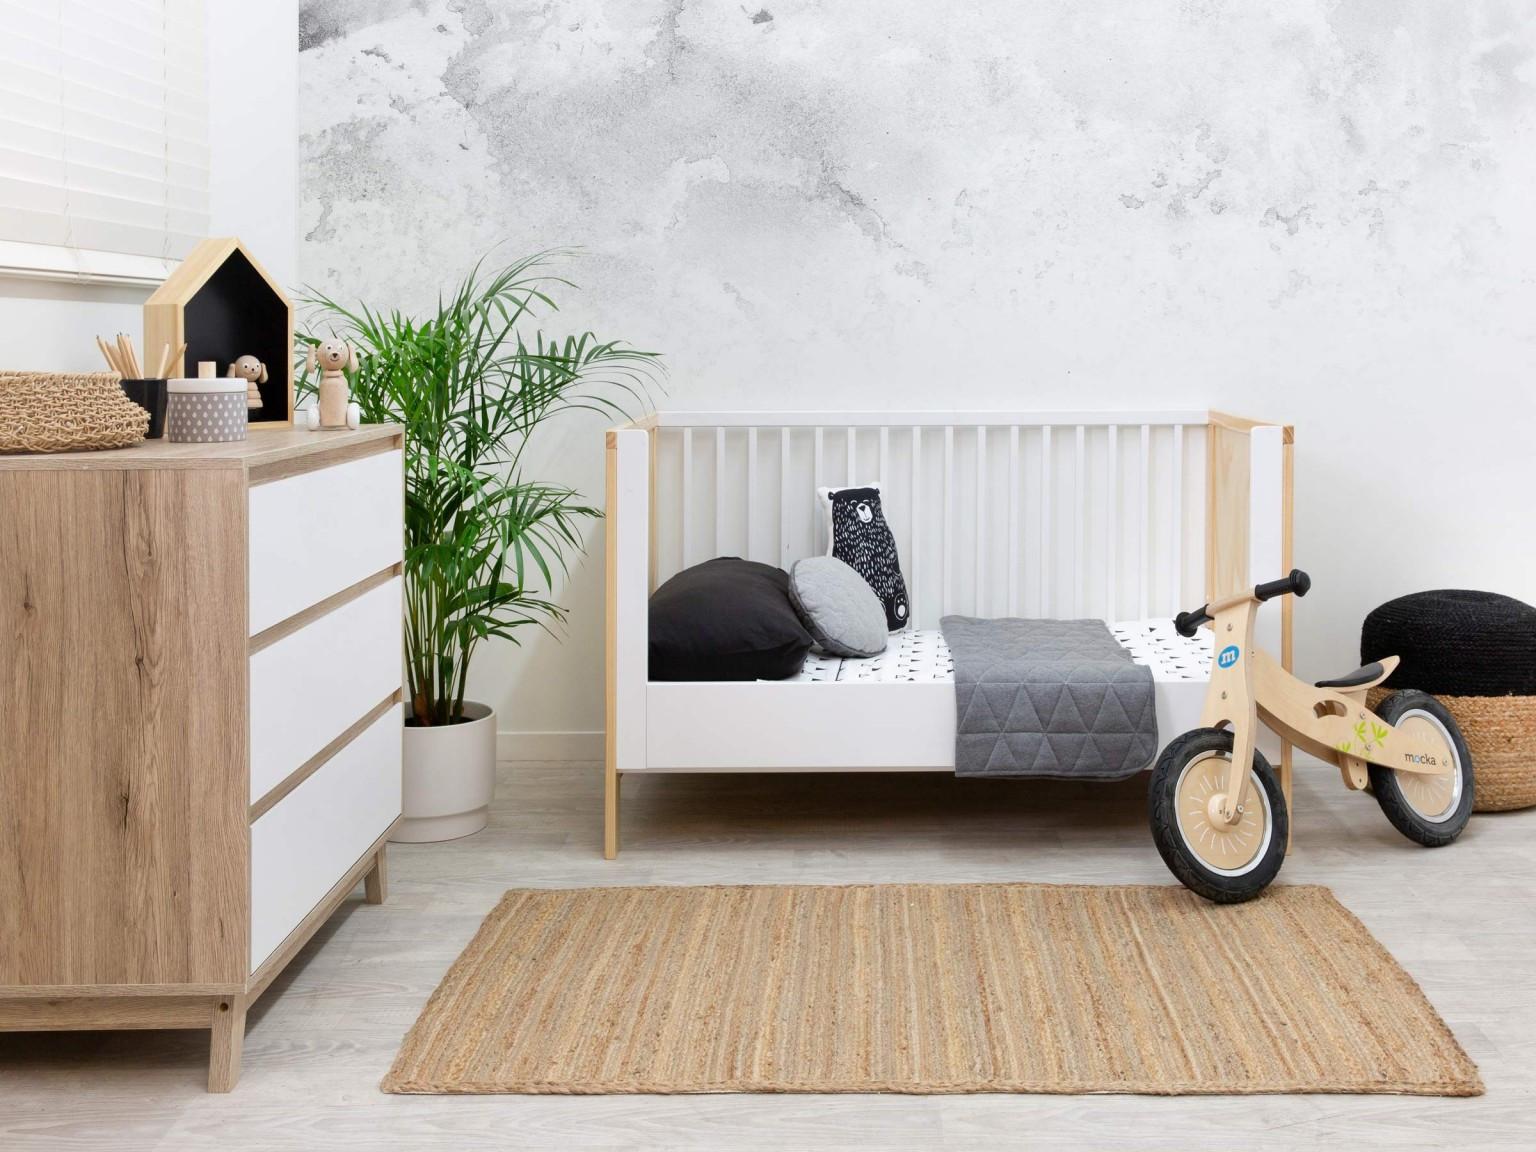 hardwood floors in bedroom or carpet of mocka piper rug living room decor shop now regarding mocka piper rug